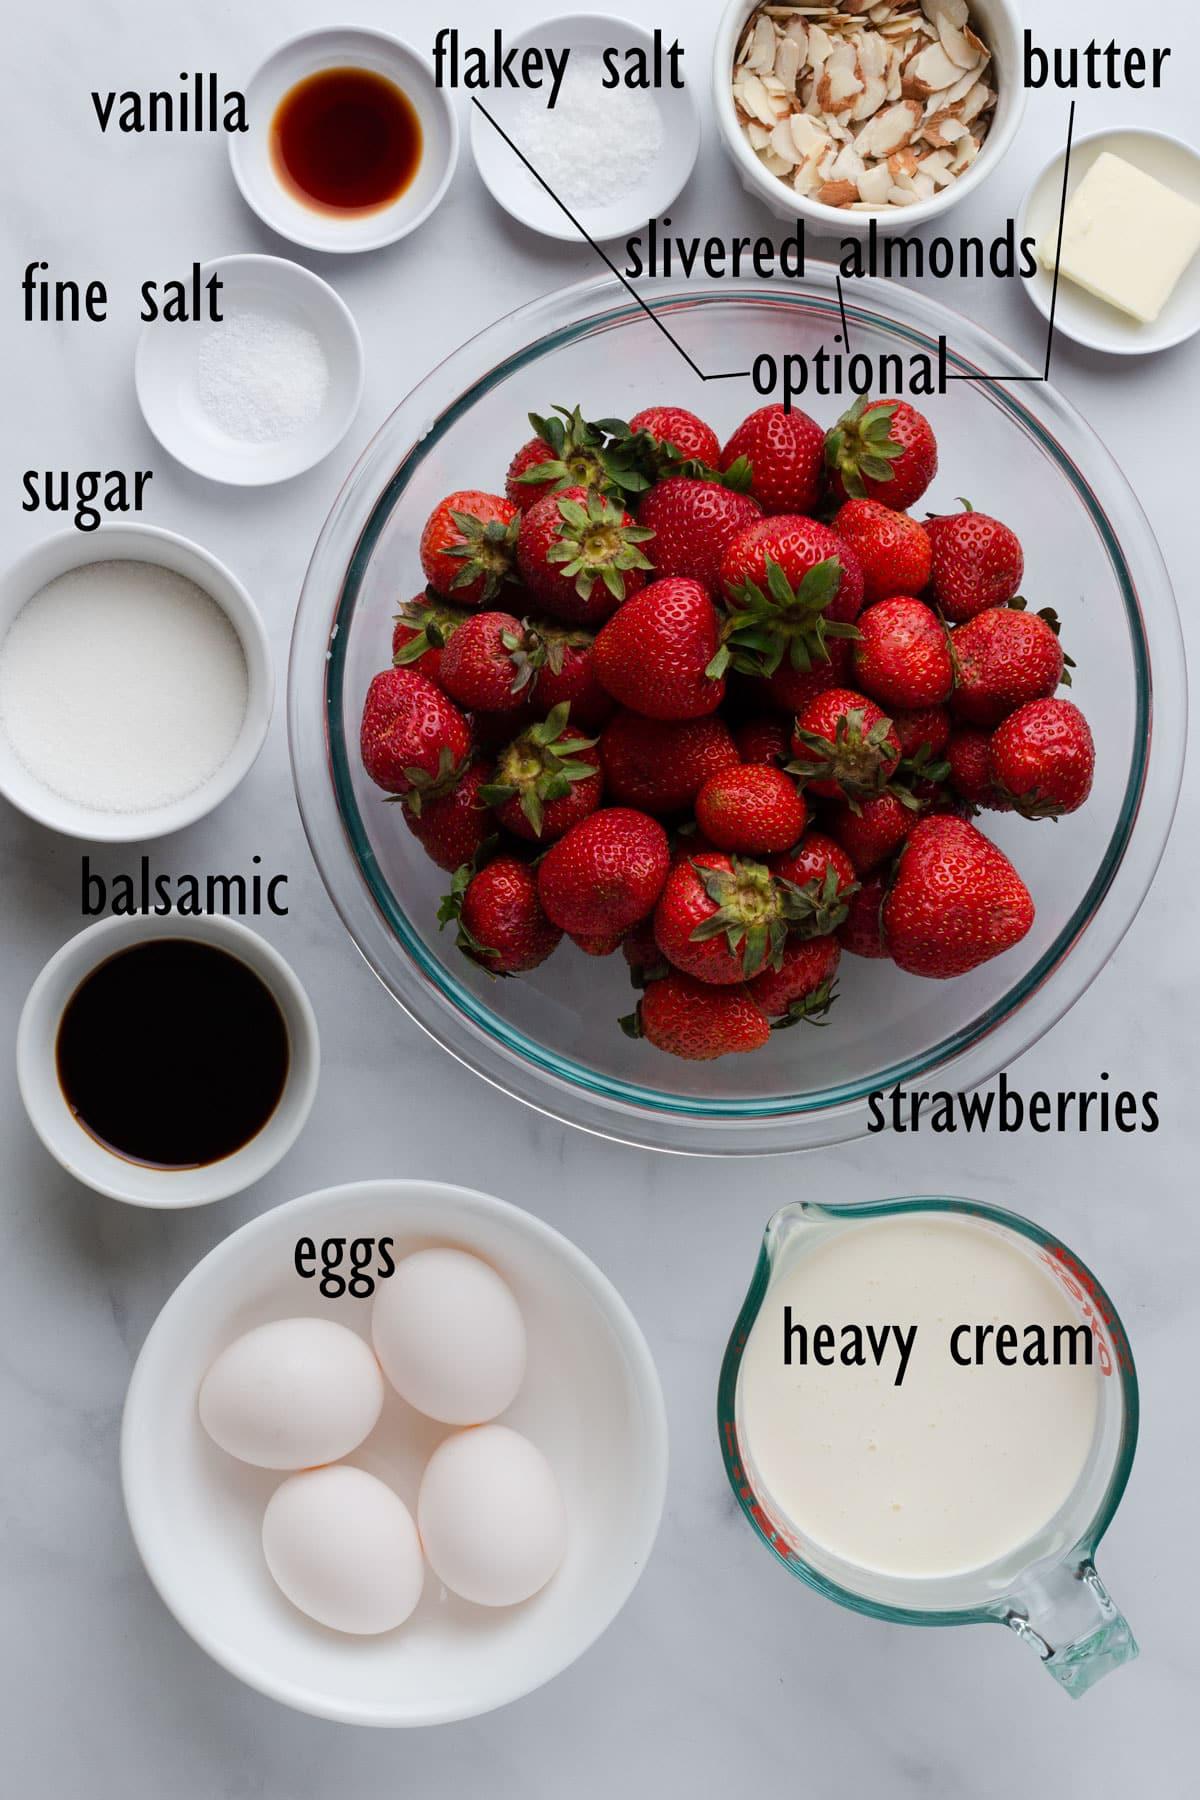 Ice cream ingredients, including strawberries, balsamic vinegar, eggs, cream and sugar.